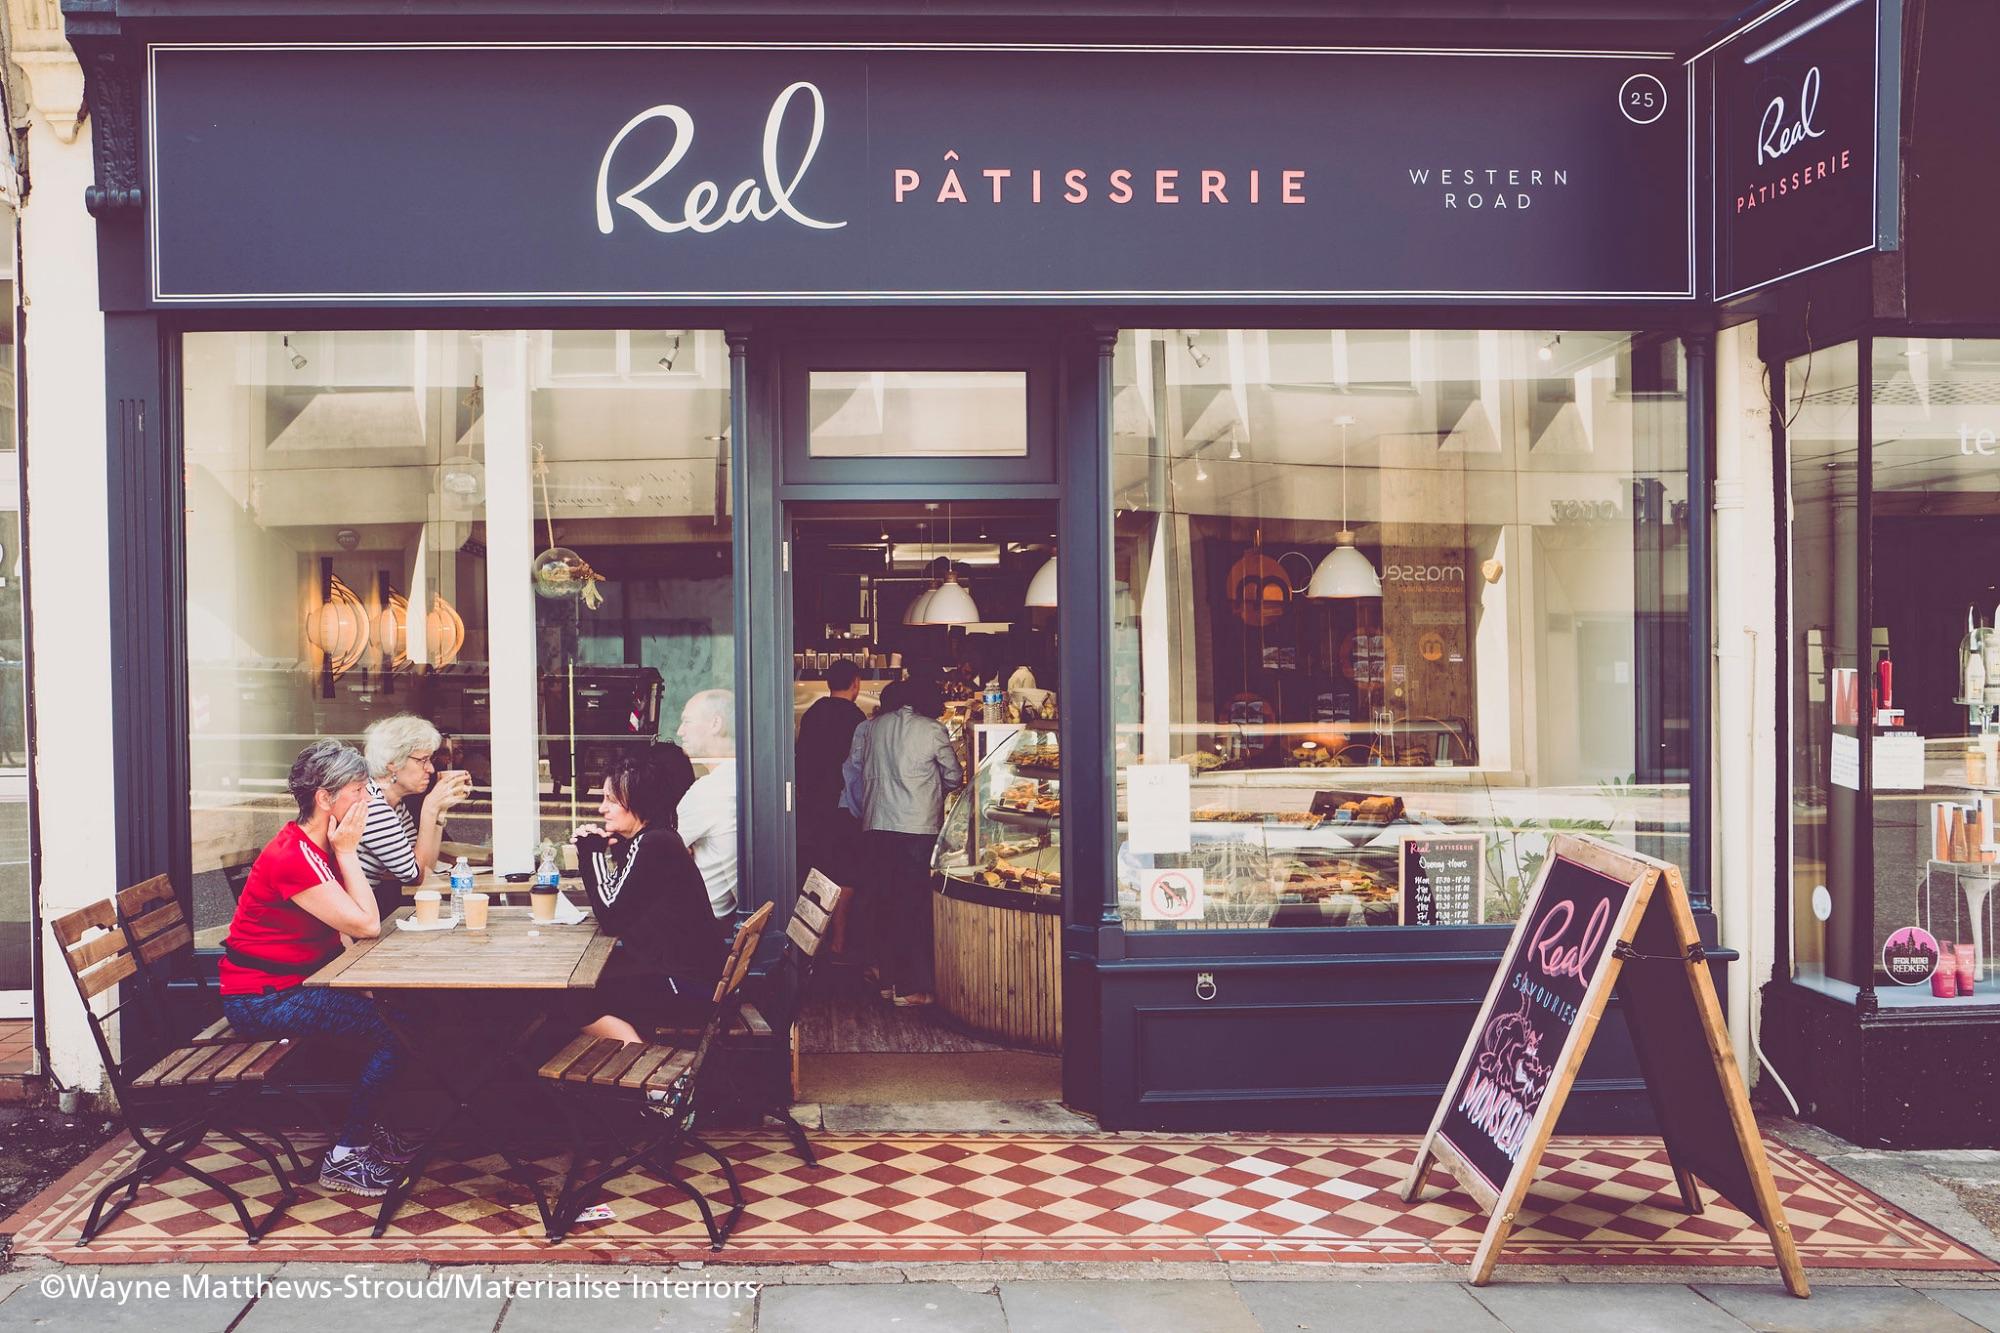 RealPatisserie Western Road_shopfront photo Wayne Matthews-Stroud